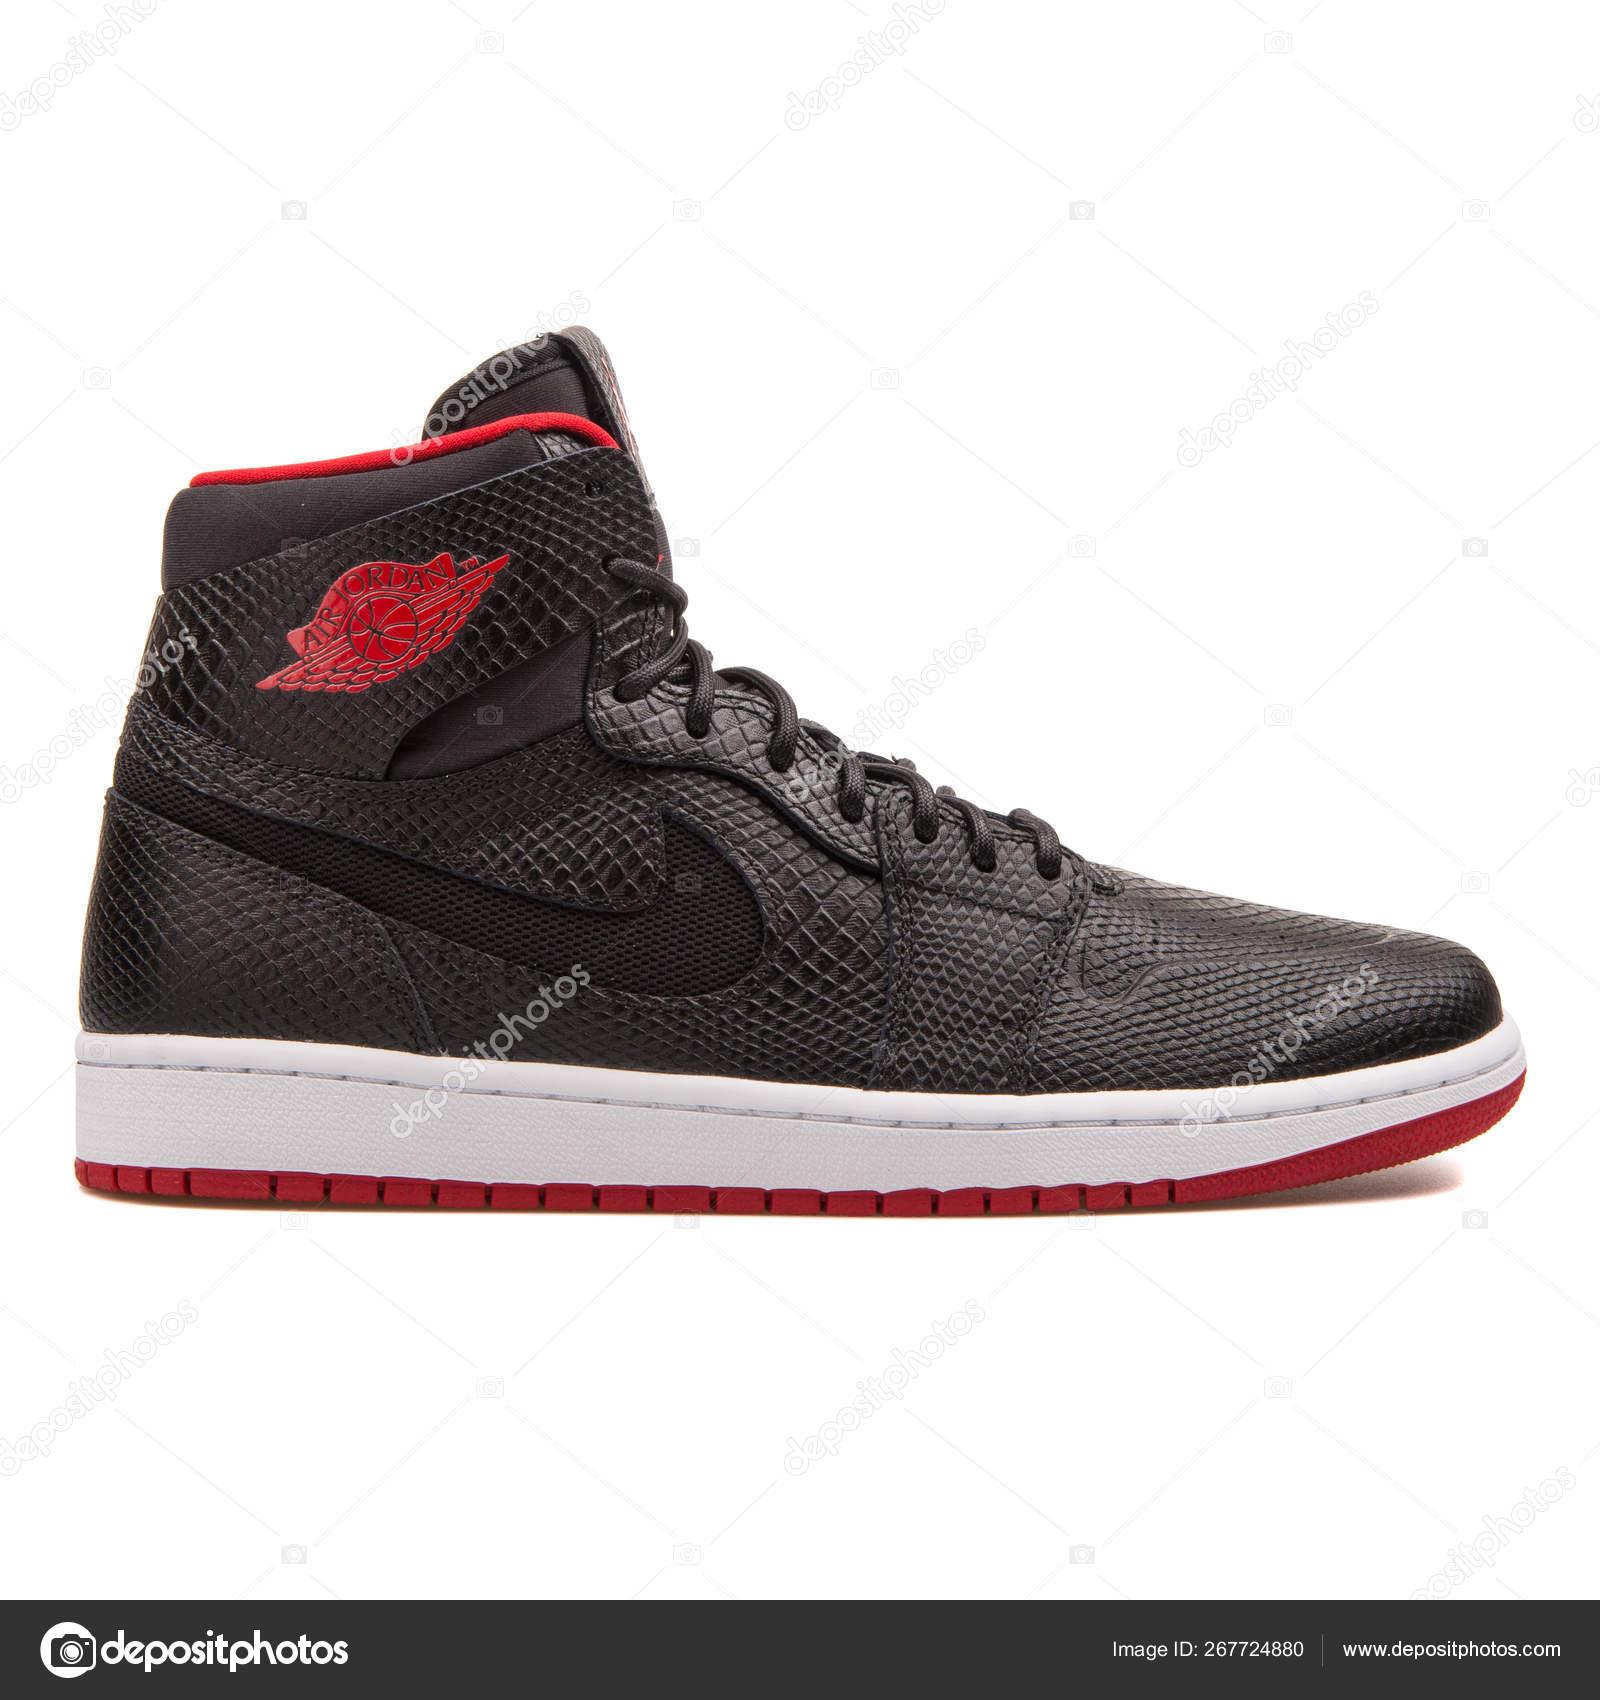 f490ce1e Nike Air Jordan 1 Retro High Nouv black and red sneaker — Stock Photo